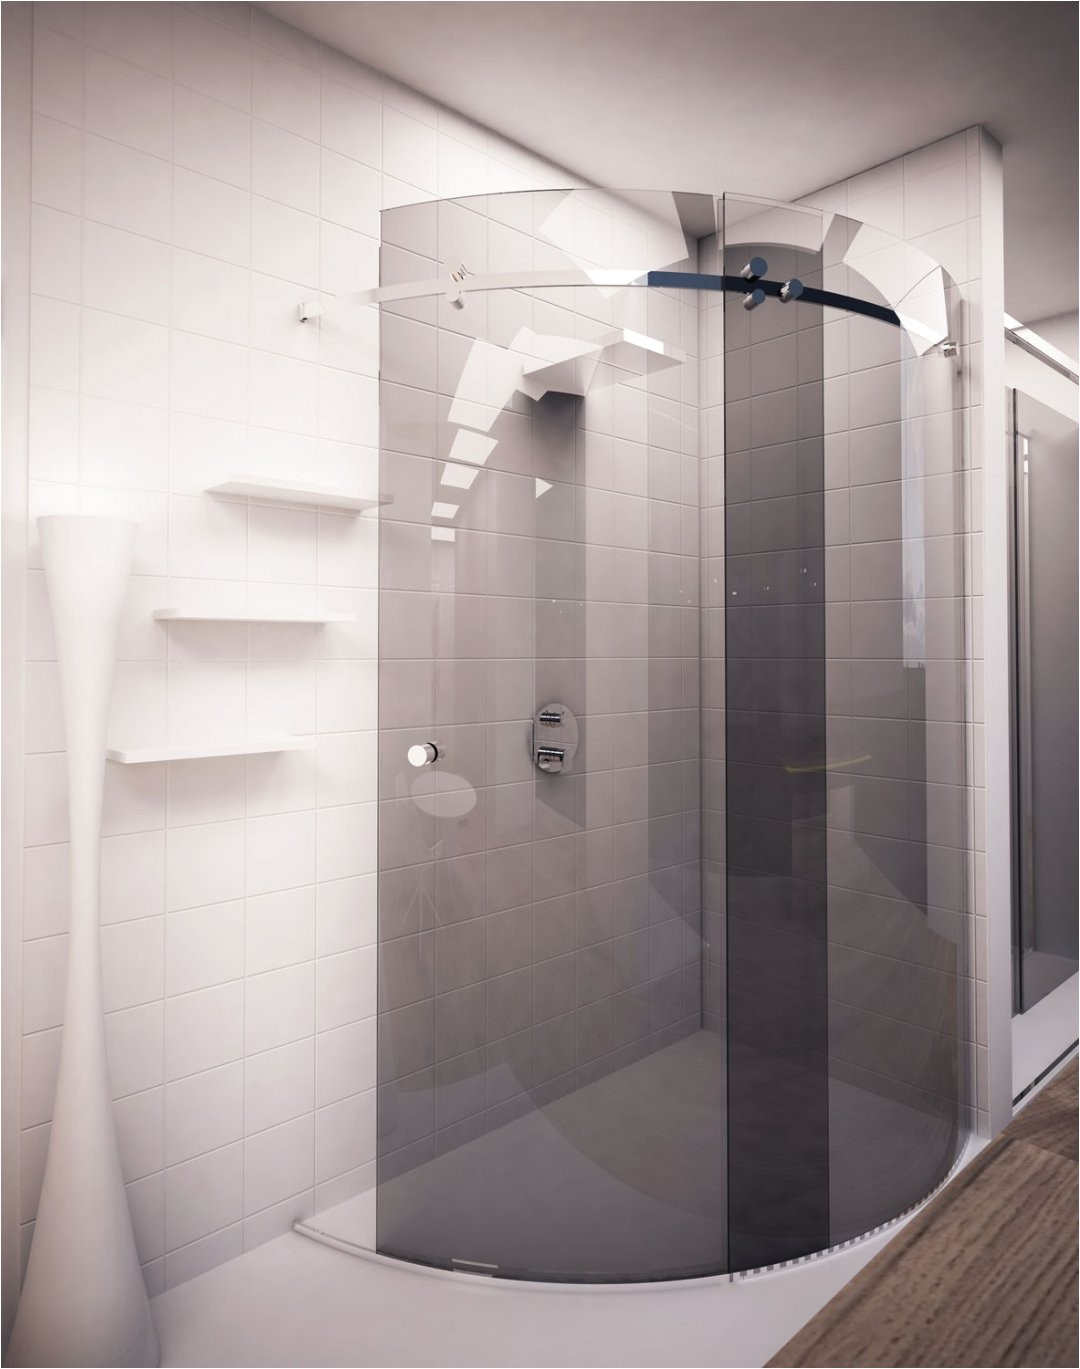 frameless shower door installation gl doors home depot emejing for walk in showers photos house designs